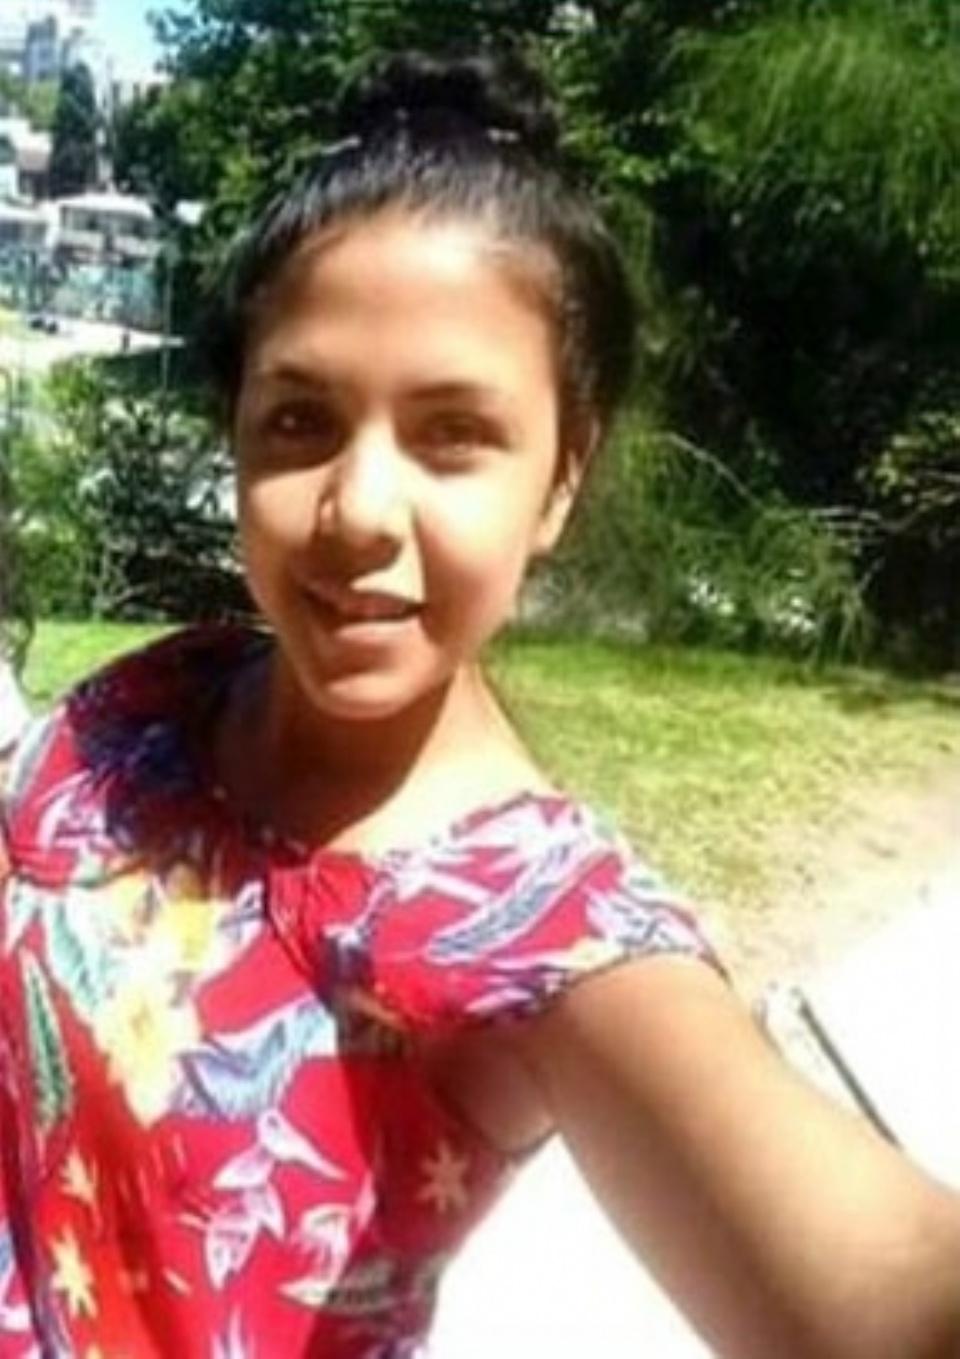 Buscan a dos adolescentes cuya misteriosa desaparición podría estar vinculada